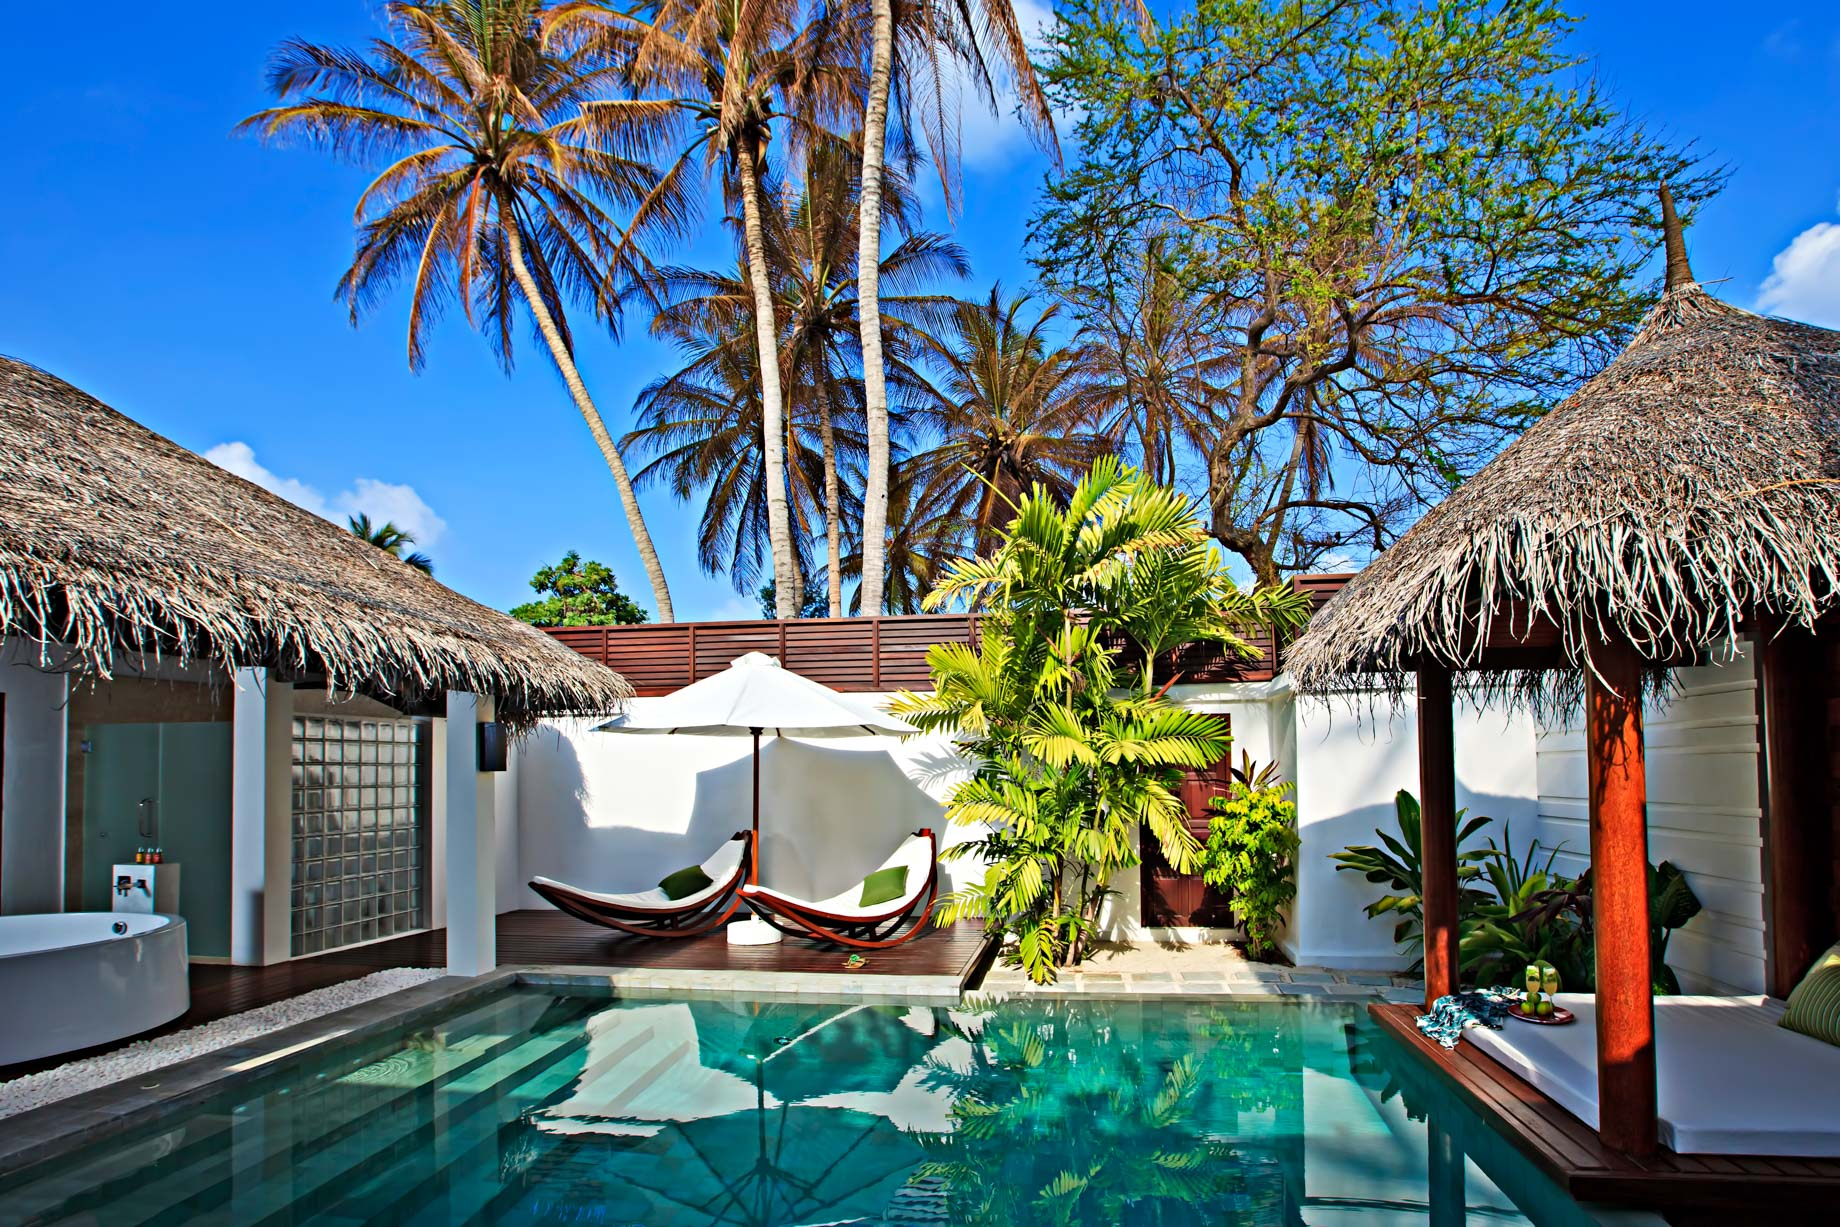 Velassaru Maldives Luxury Resort – South Male Atoll, Maldives – Tropical Beach Villa